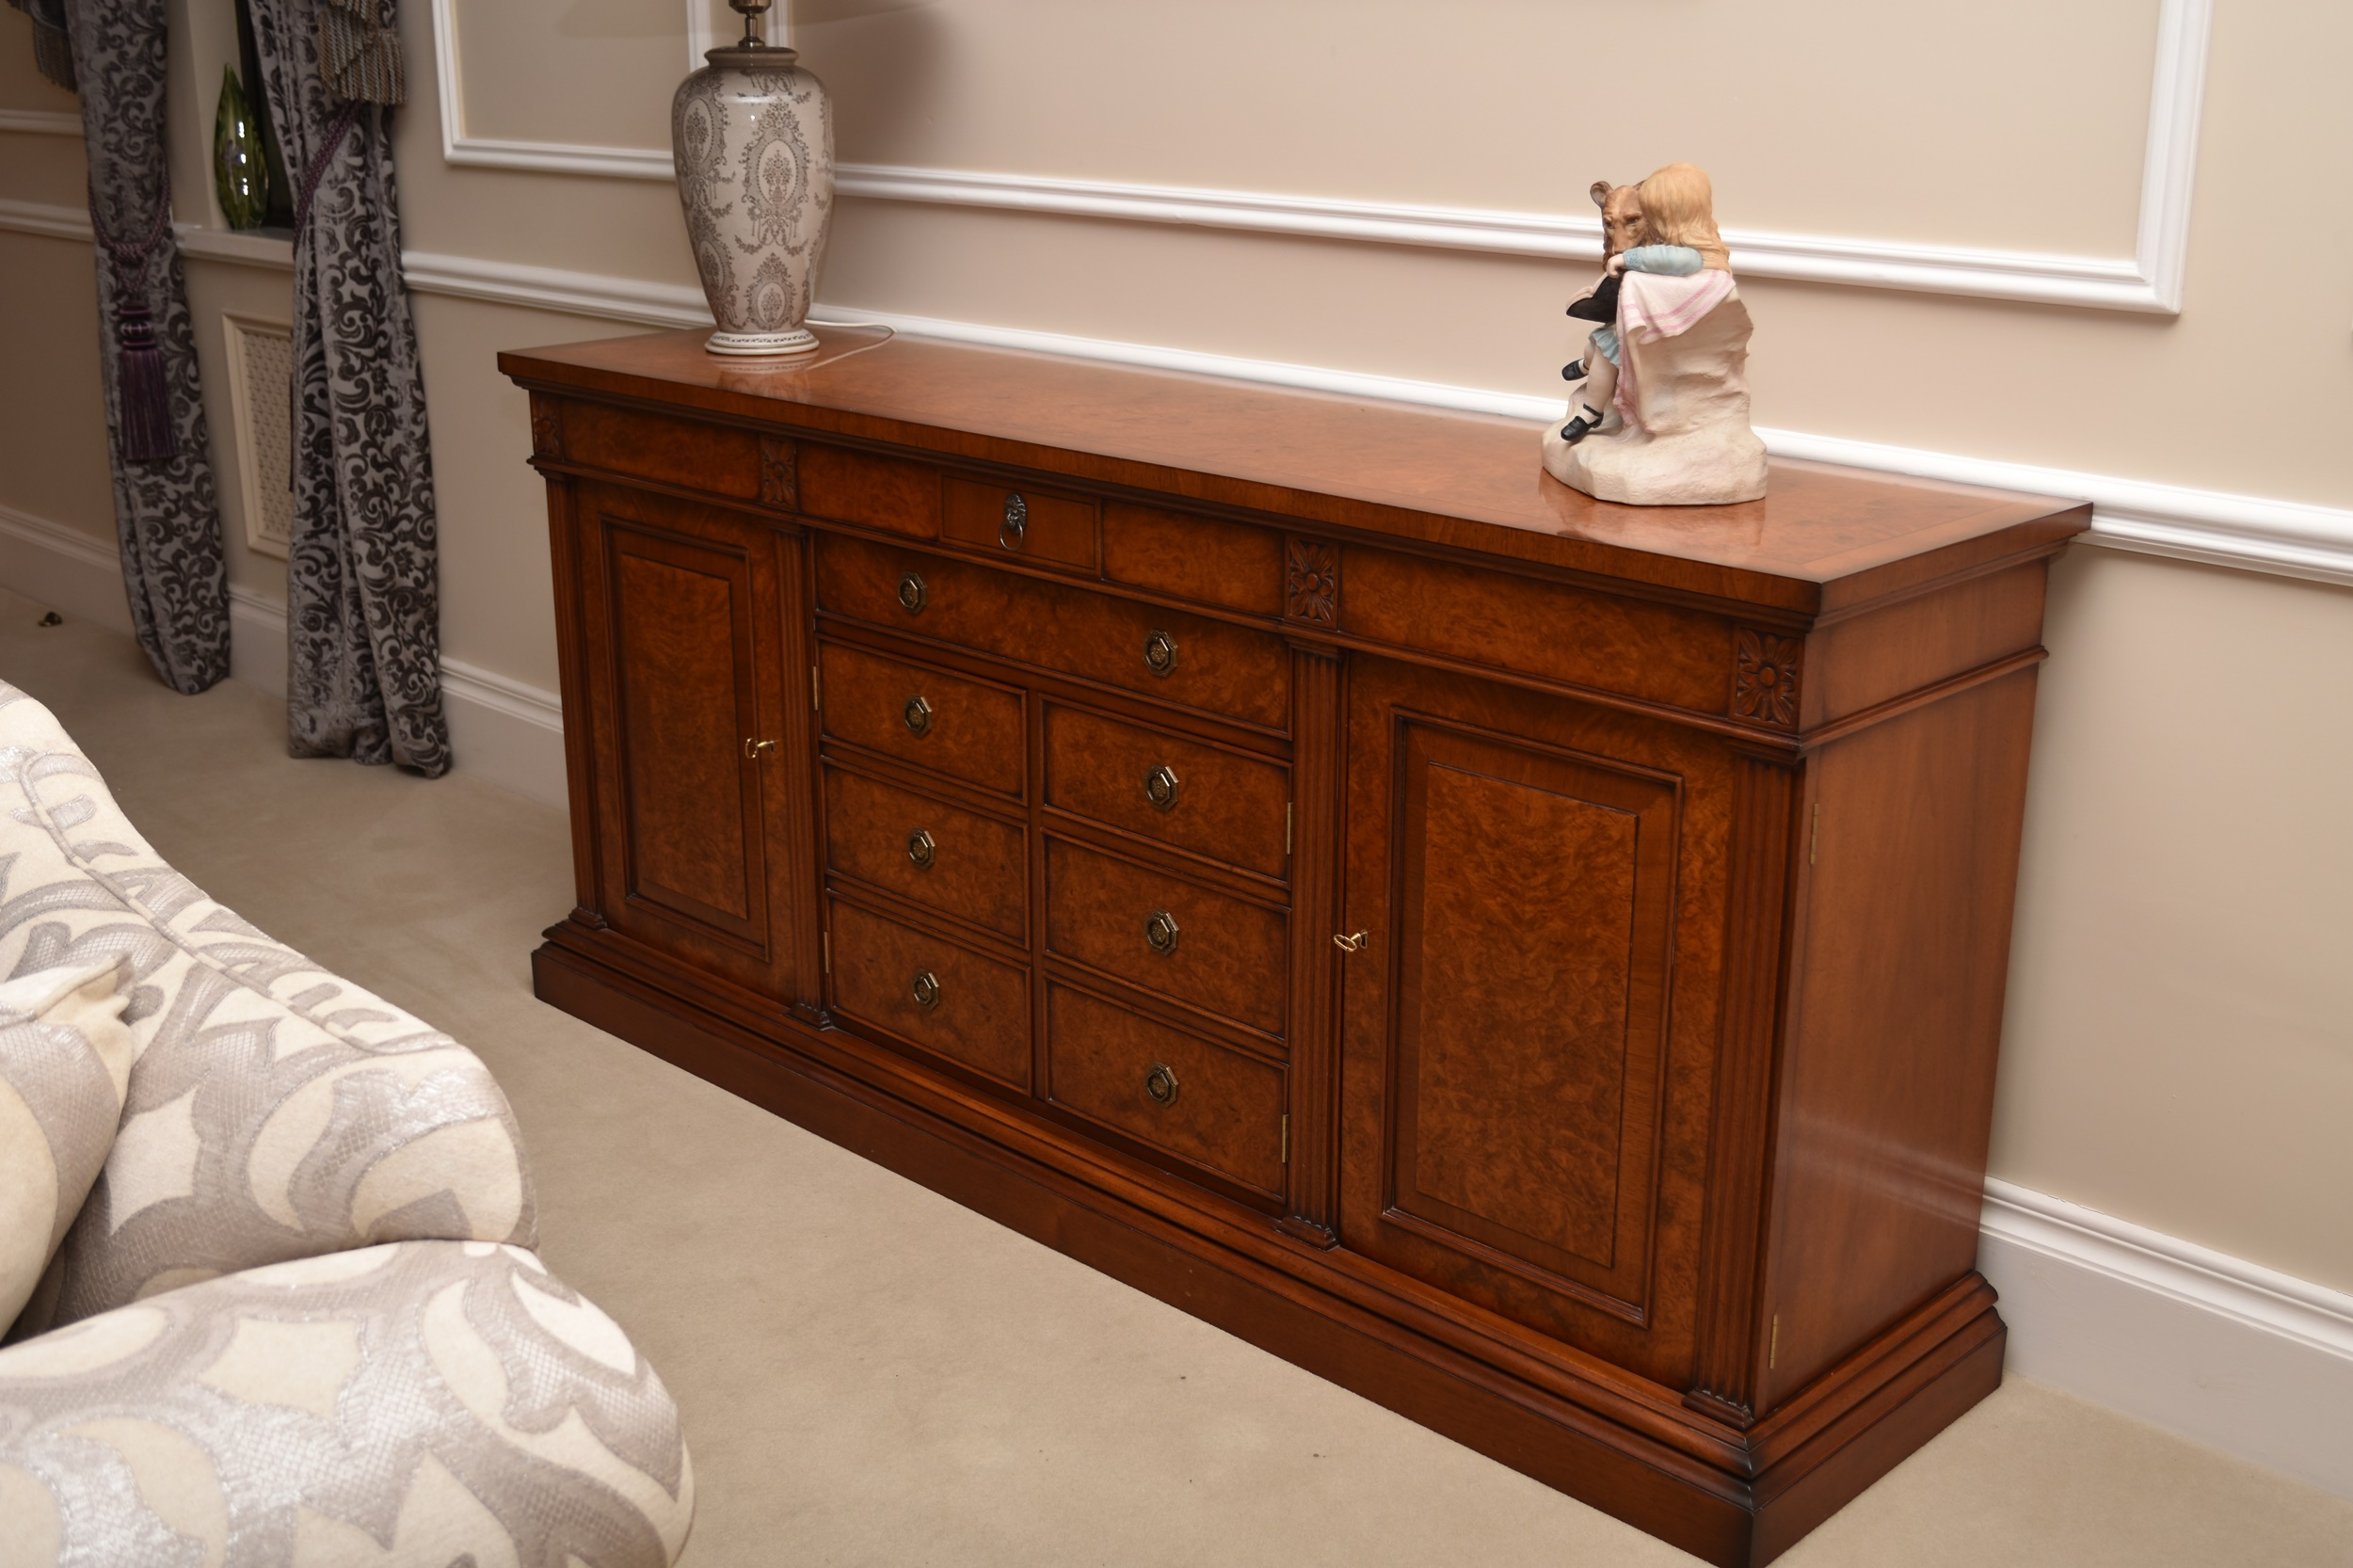 A Charles Barr burr walnut and mahogany veneered credenza-form sideboard